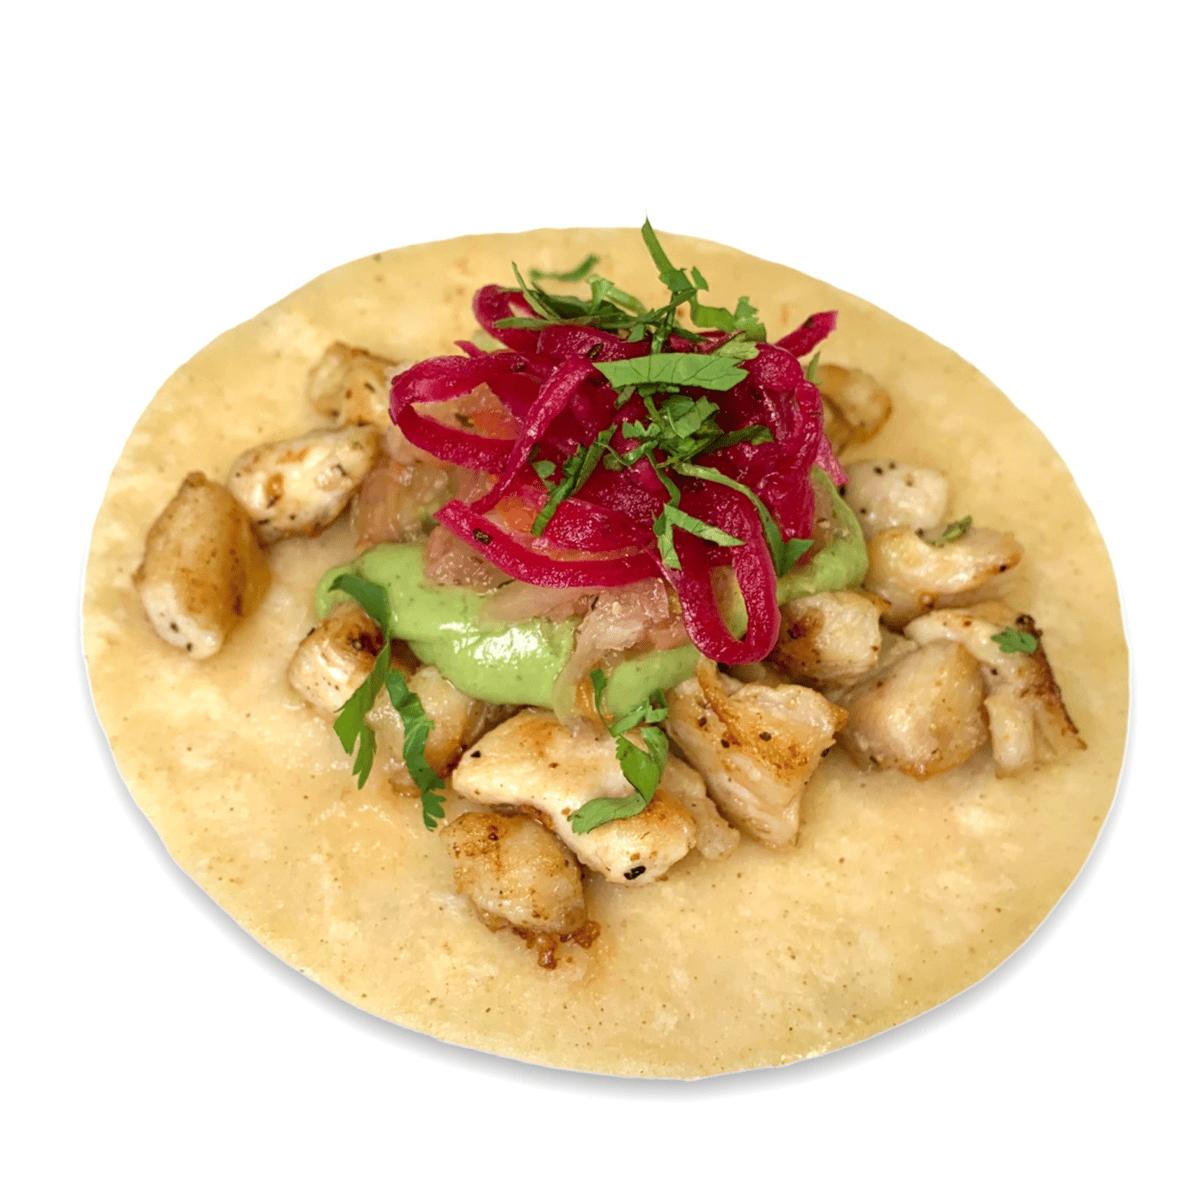 24. Grilled Chicken Taco